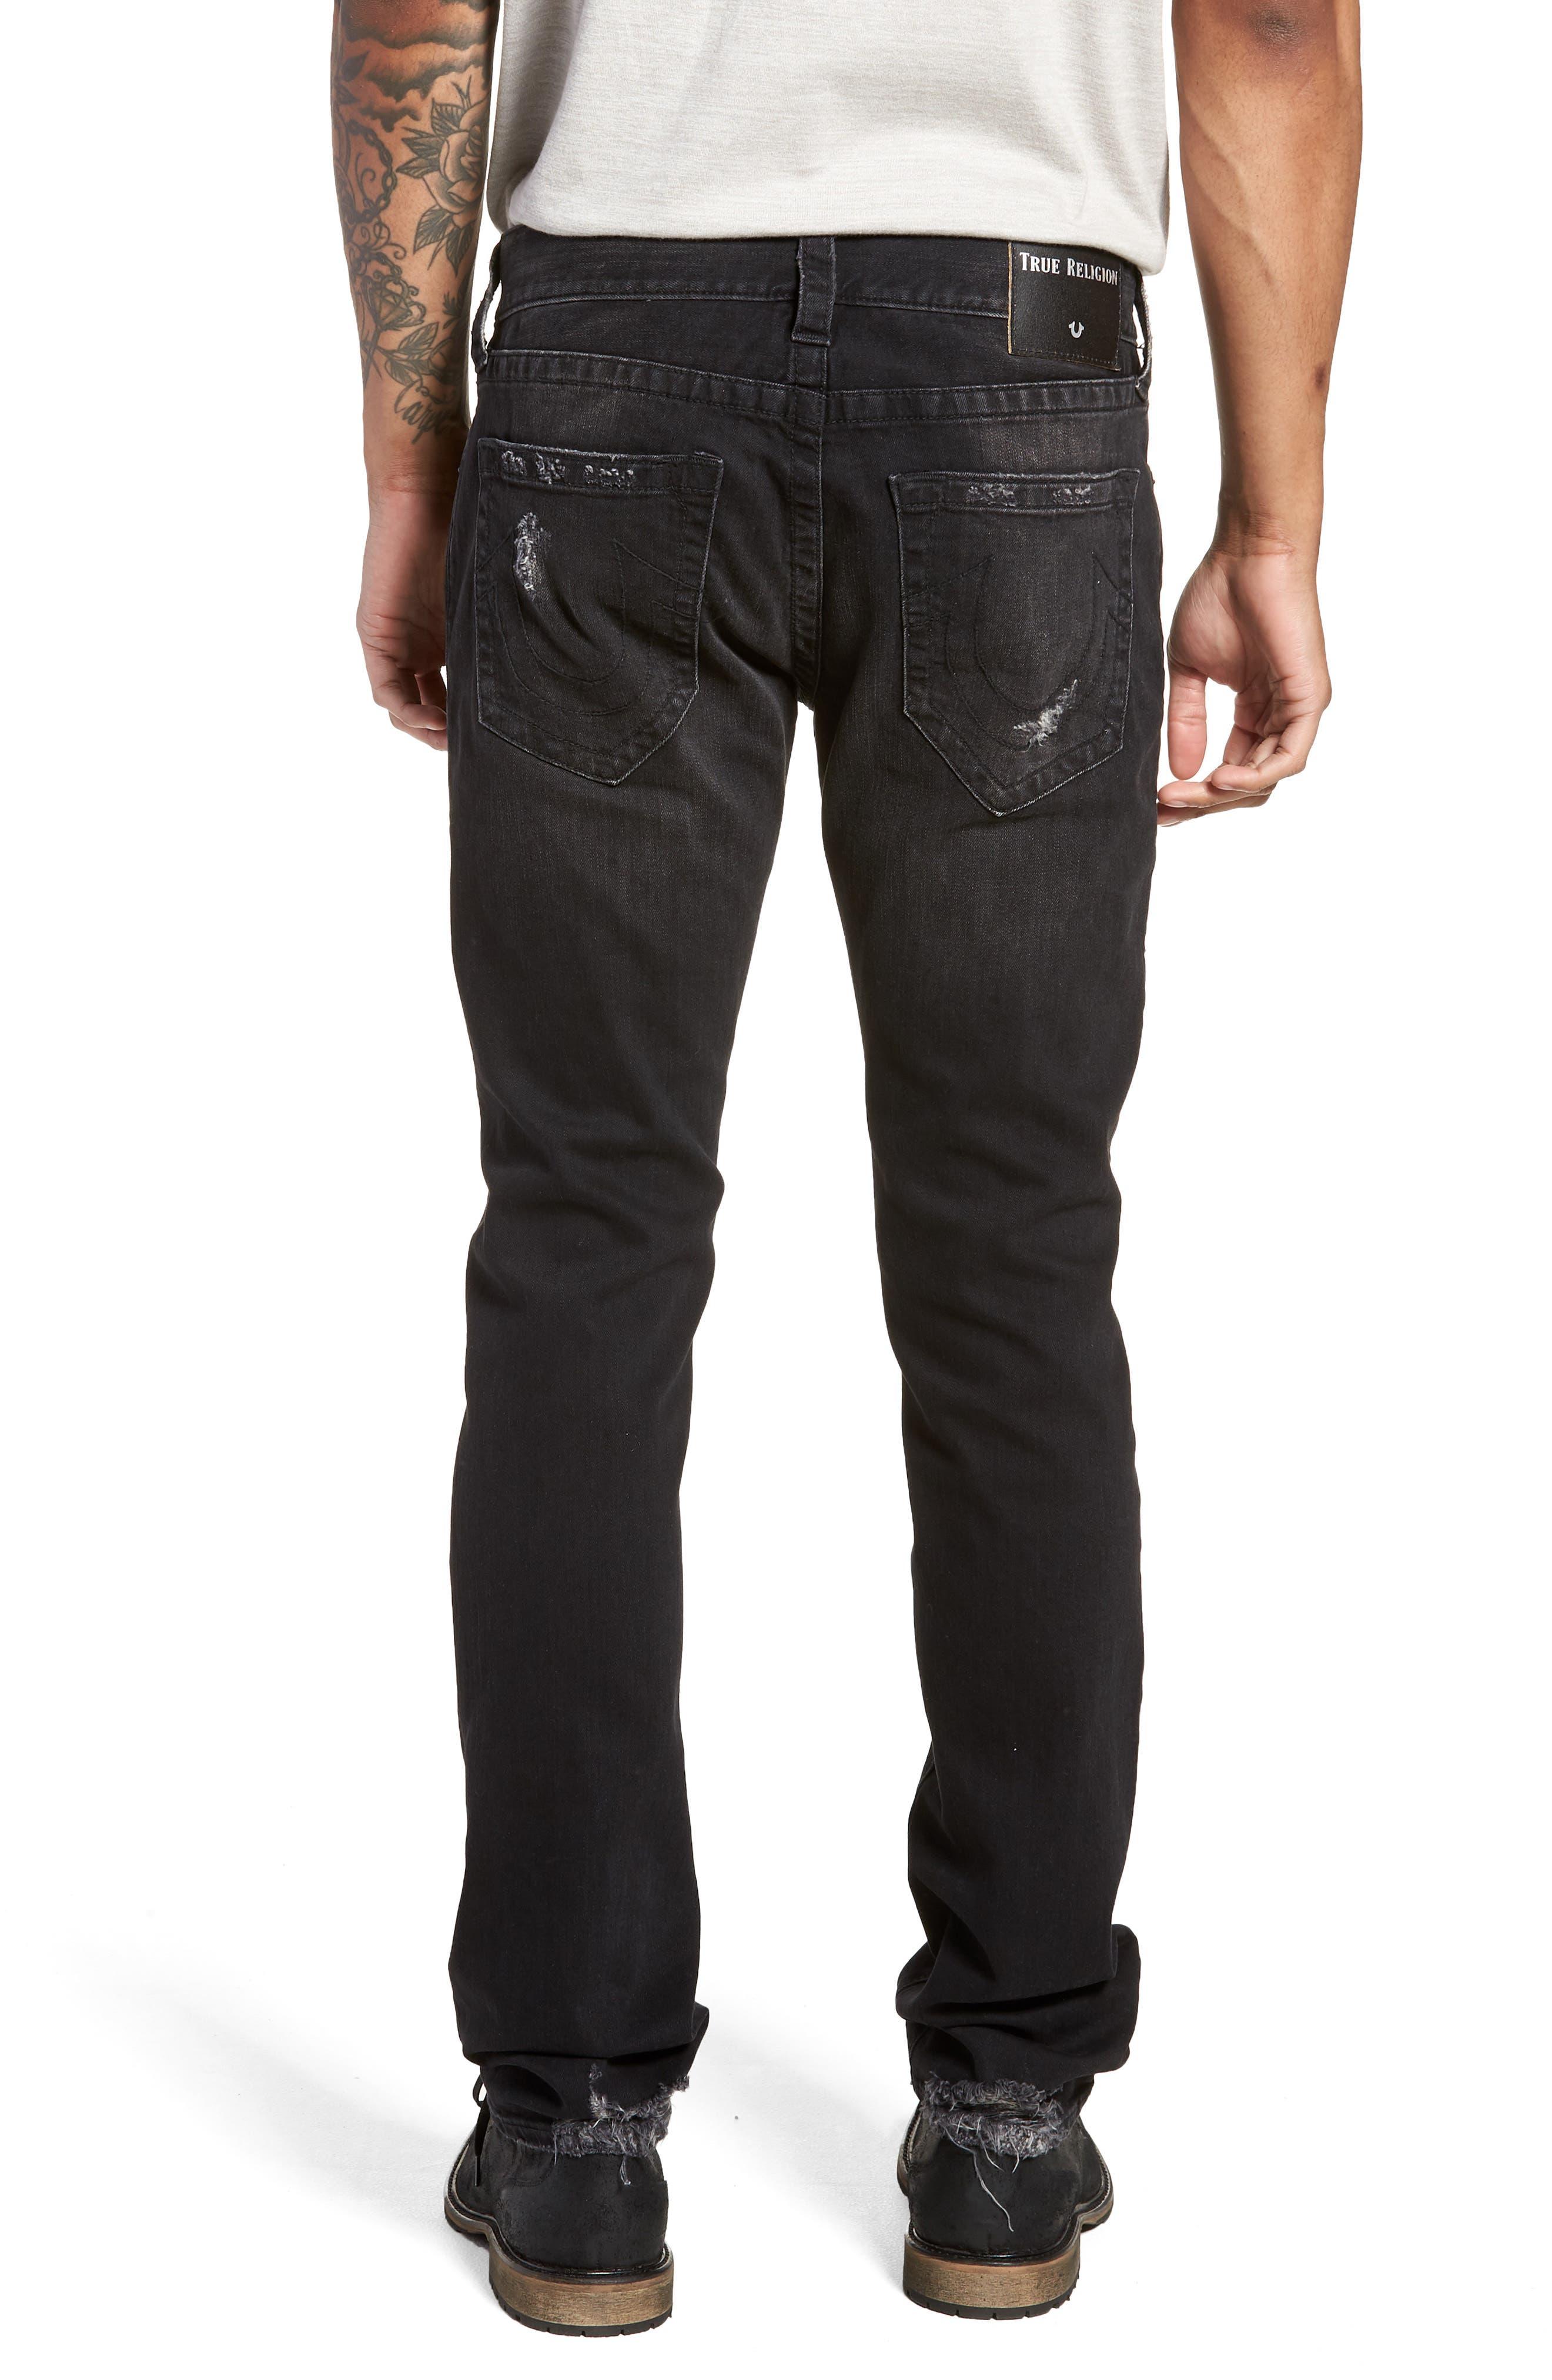 Rocco Skinny Fit Jeans,                             Alternate thumbnail 2, color,                             EQYD DARK STREET